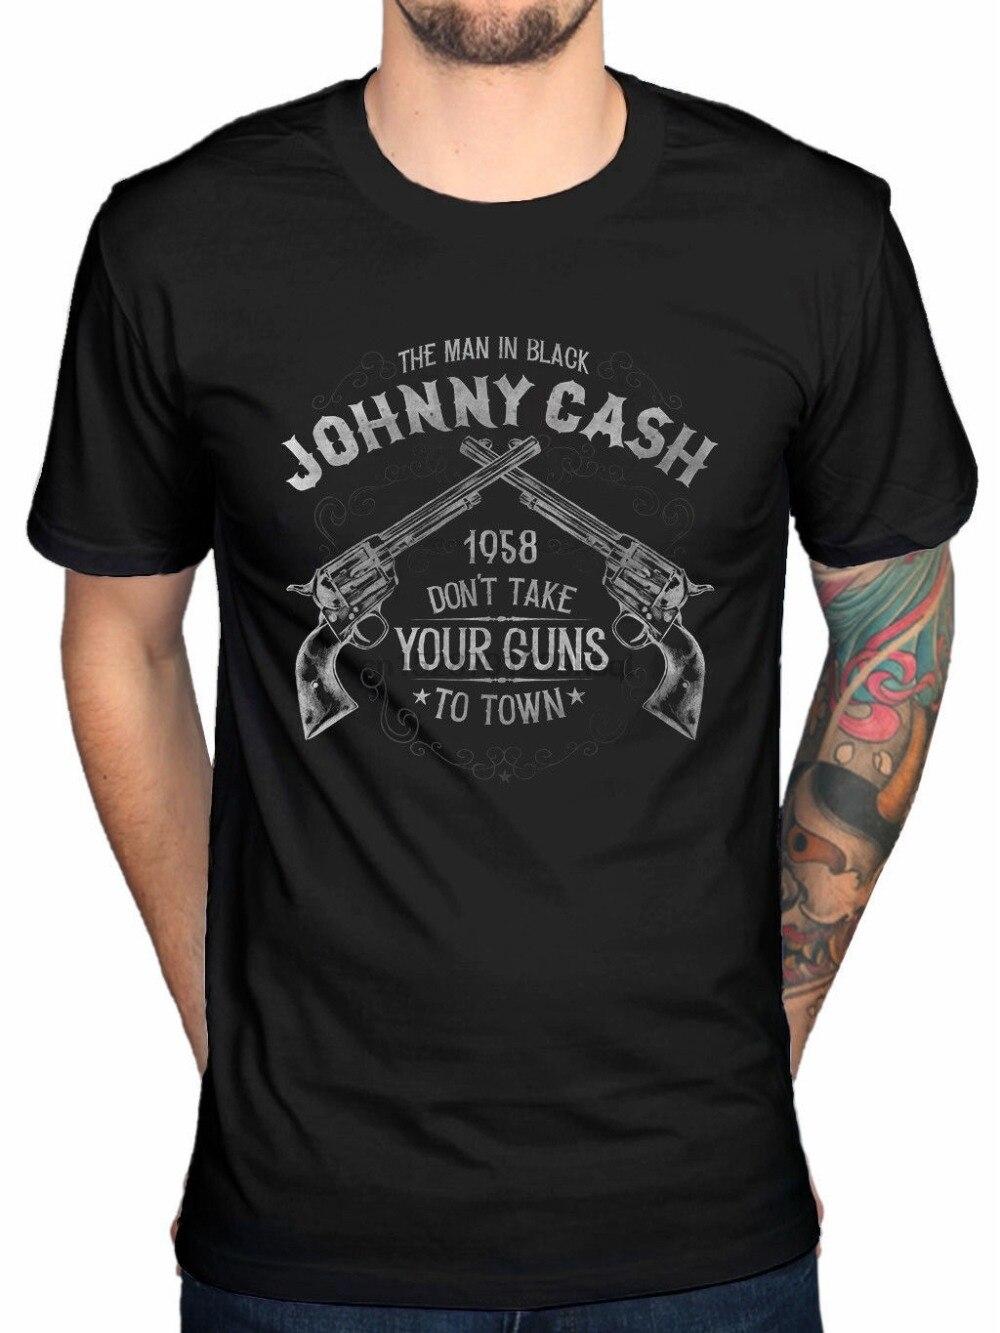 2019 nueva Camiseta de algodón de Johnny Cash Take Your Guns para hombre Camiseta de algodón negro camiseta de nueva moda